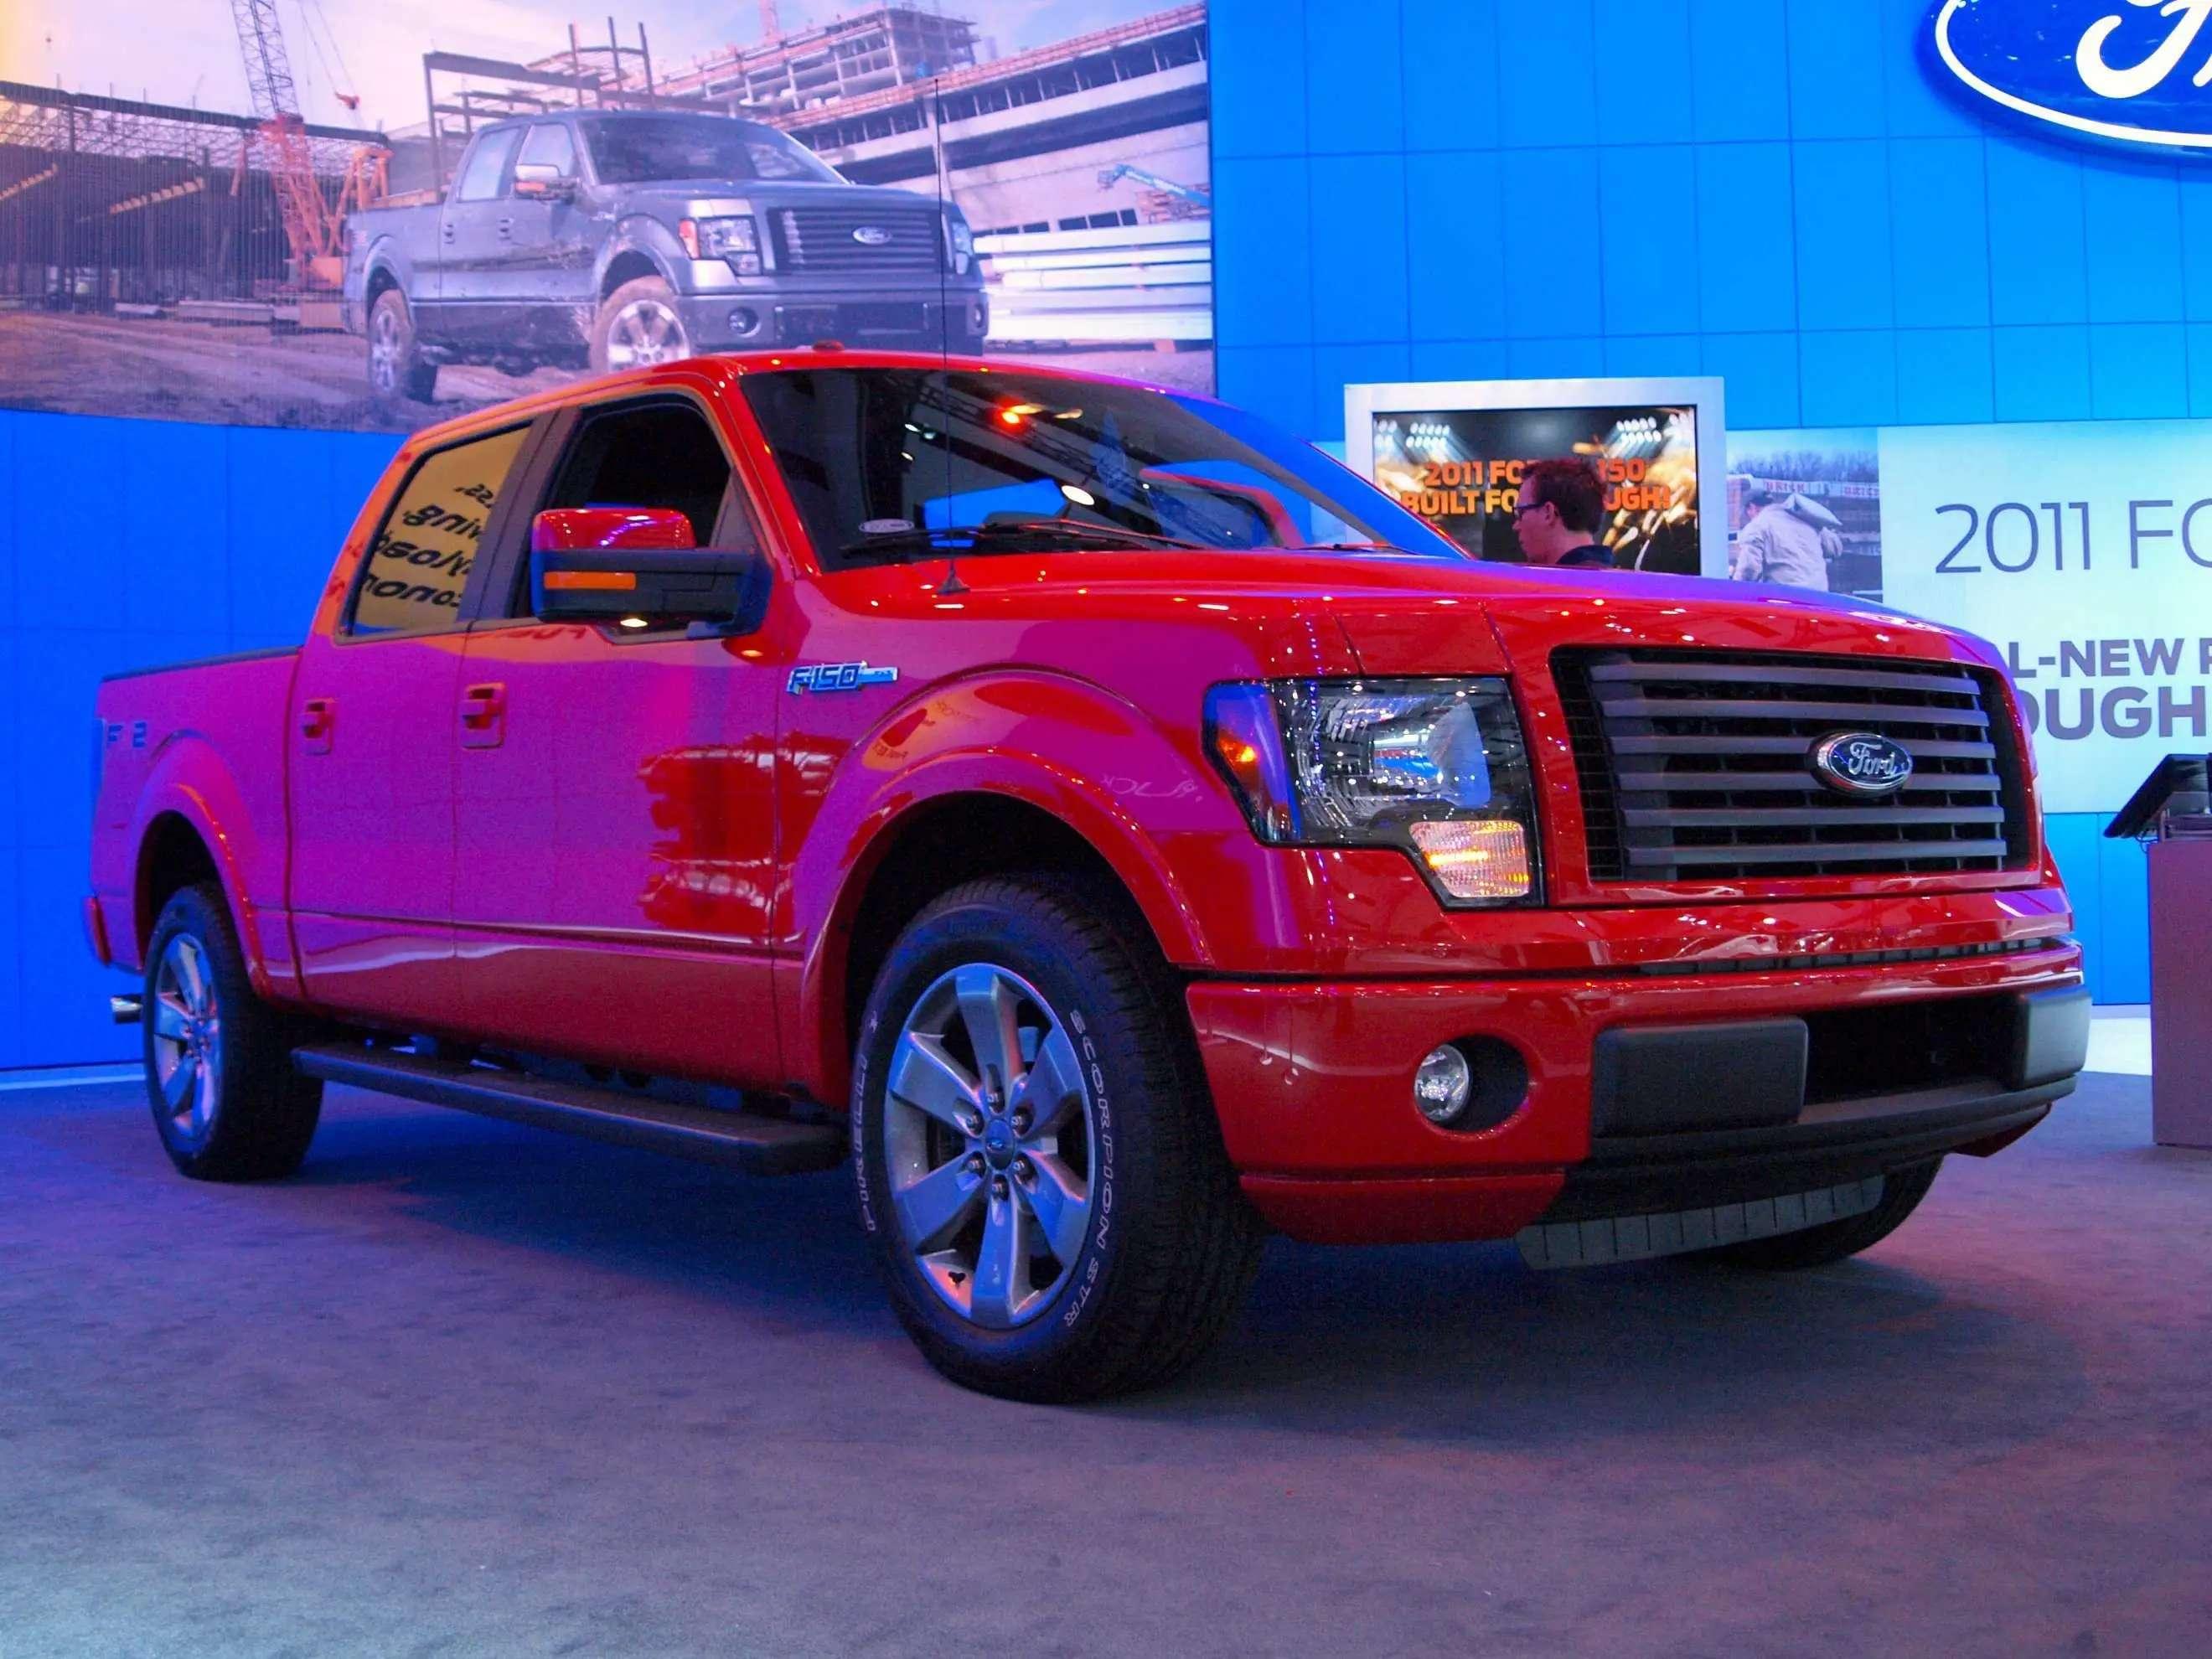 6) Ford: 28% Upside